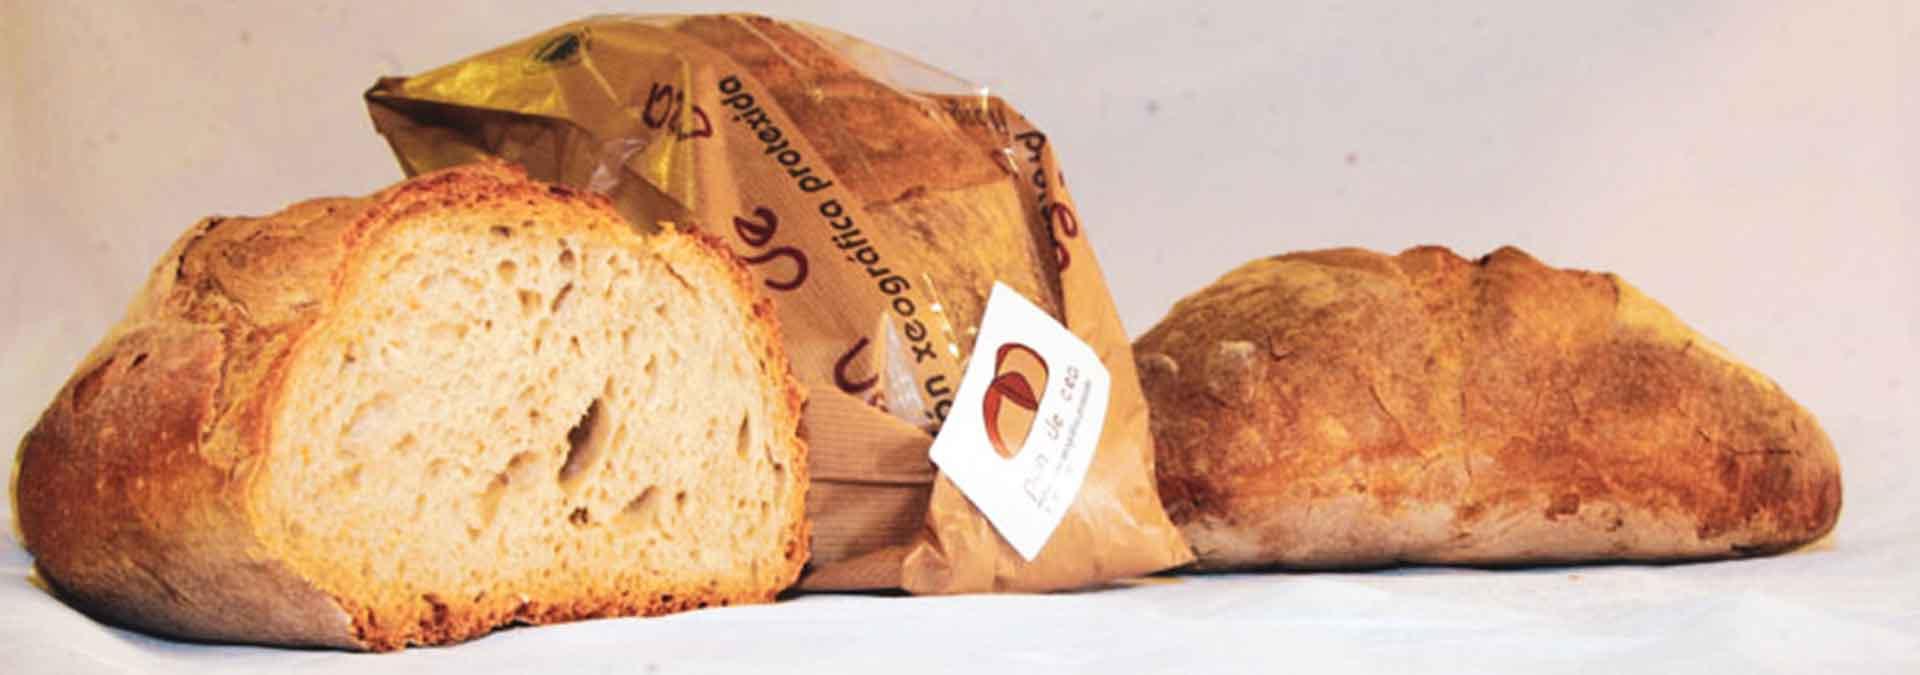 pan de cea de galicia